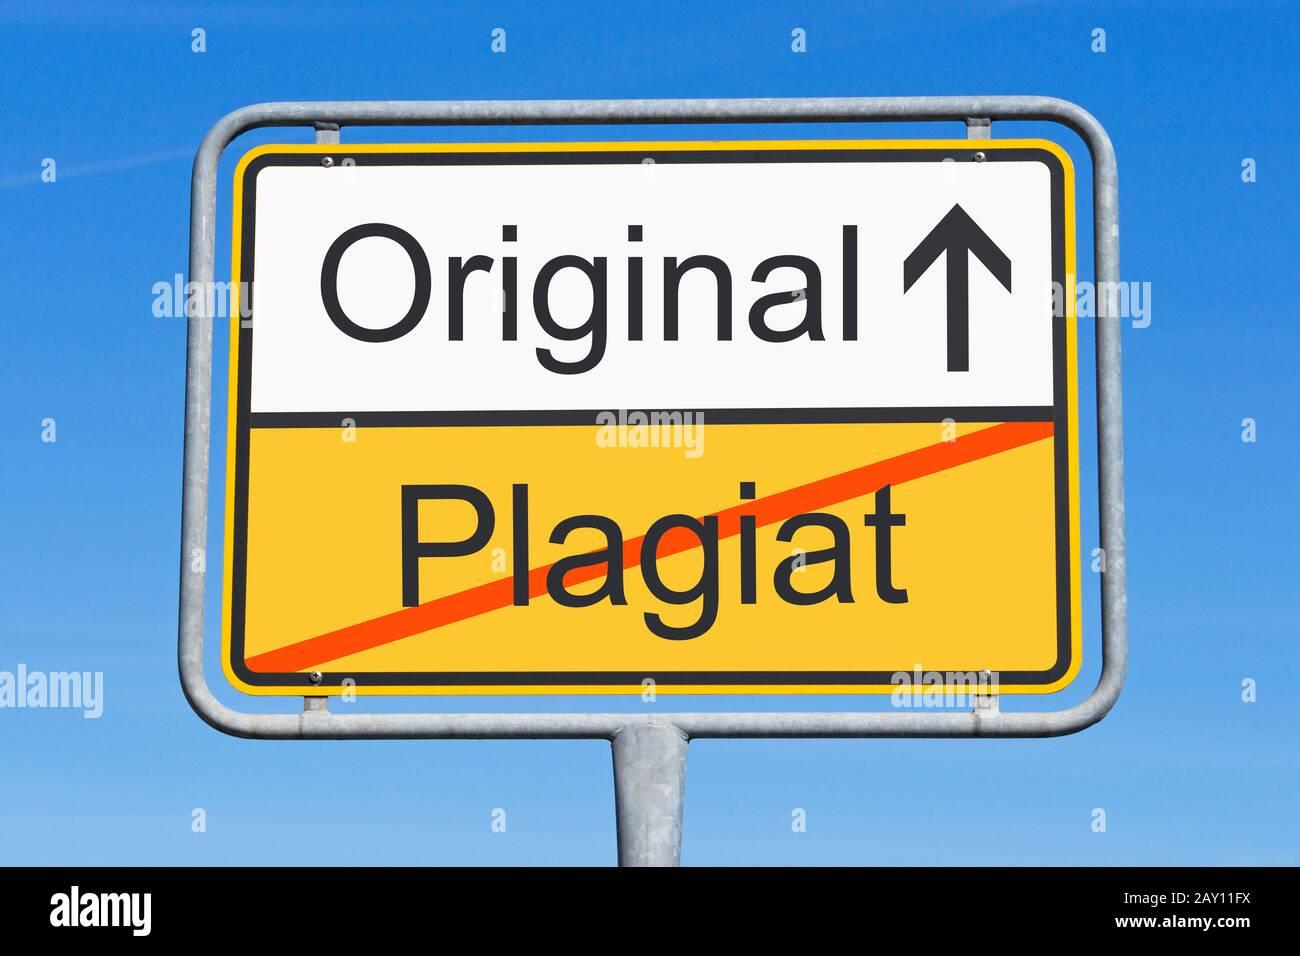 https www alamy com plagiat und original image343615886 html